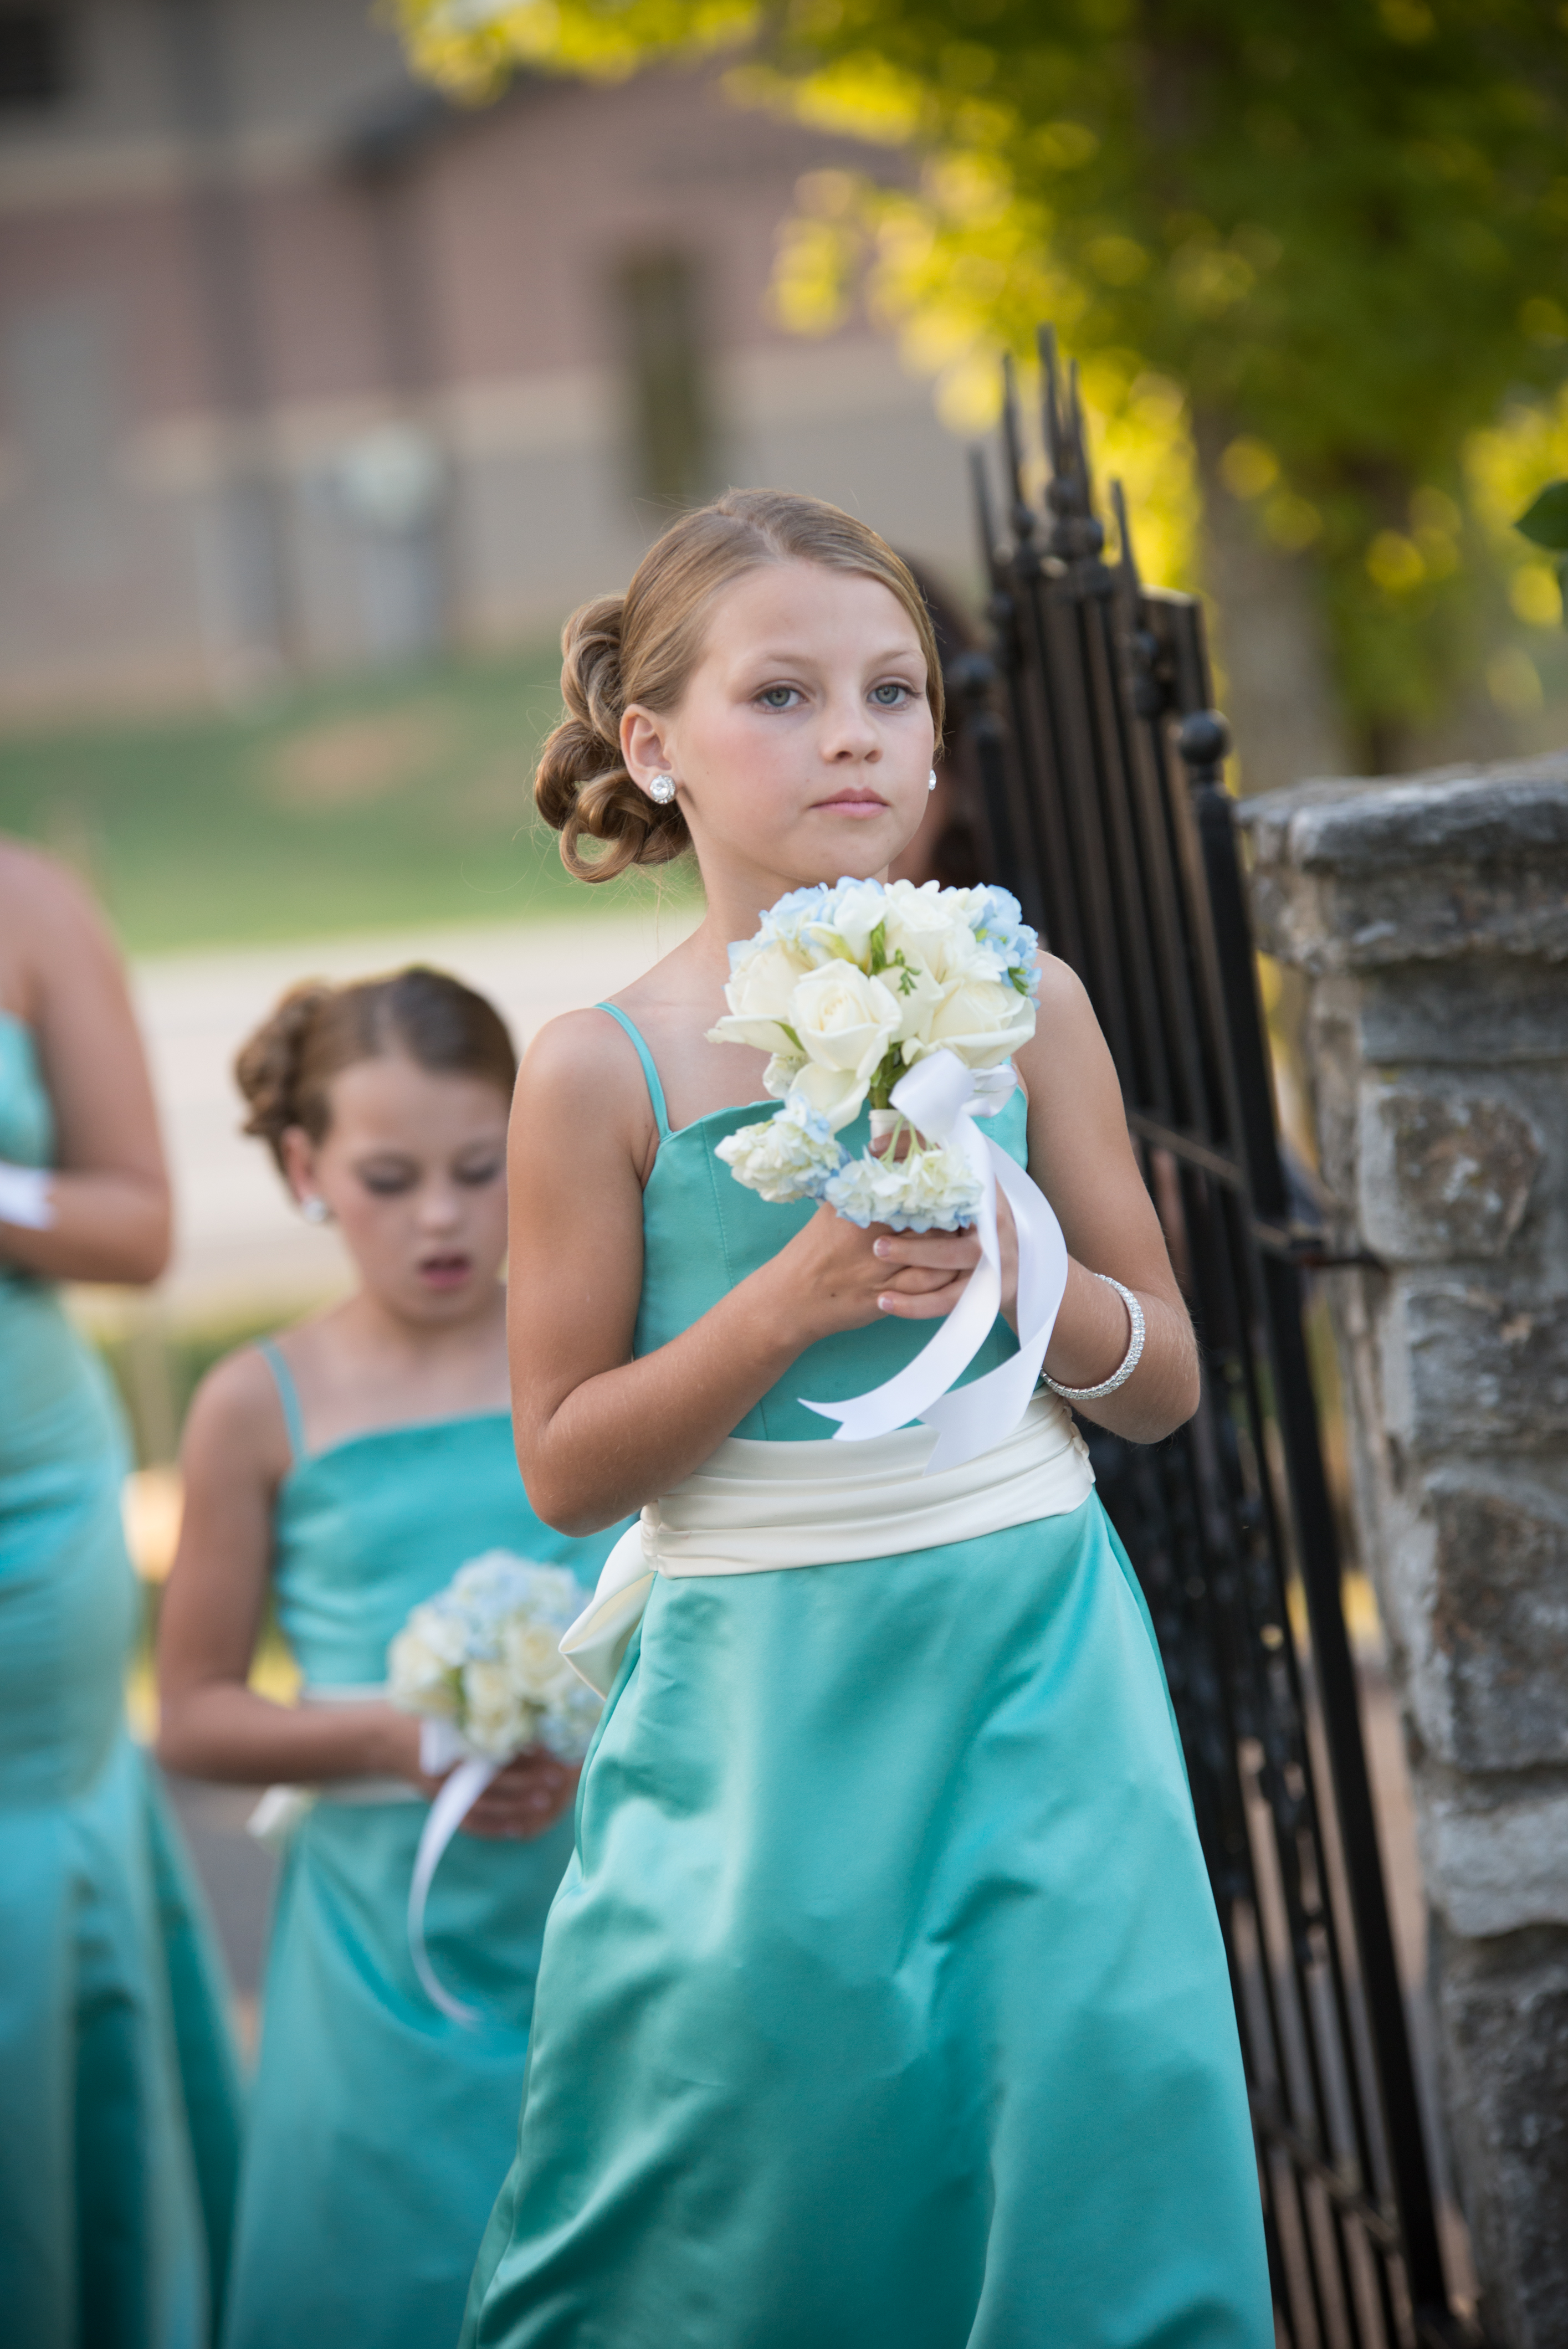 Matt-Blakely-wedding-nashville-tn-legacy-farms-812